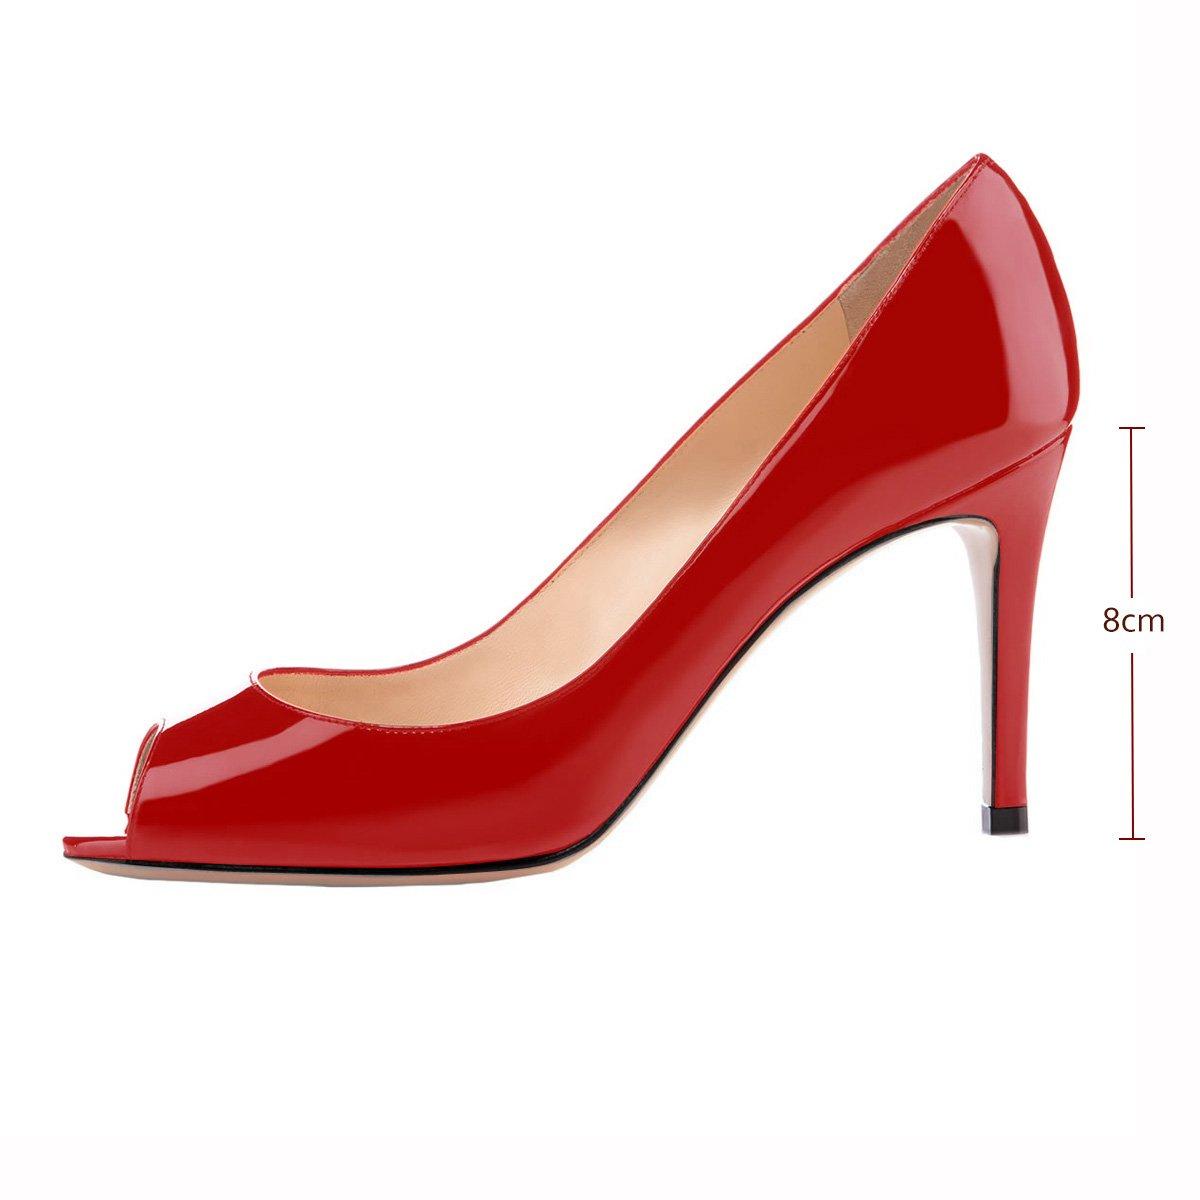 Eldof Women Pumps Peep Toe Pumps Mid-Heel Pumps Women Formal Wedding Bridal Classic Heel Open Toe Stiletto B07F1KTWCT 7 B(M) US|Red 32a763